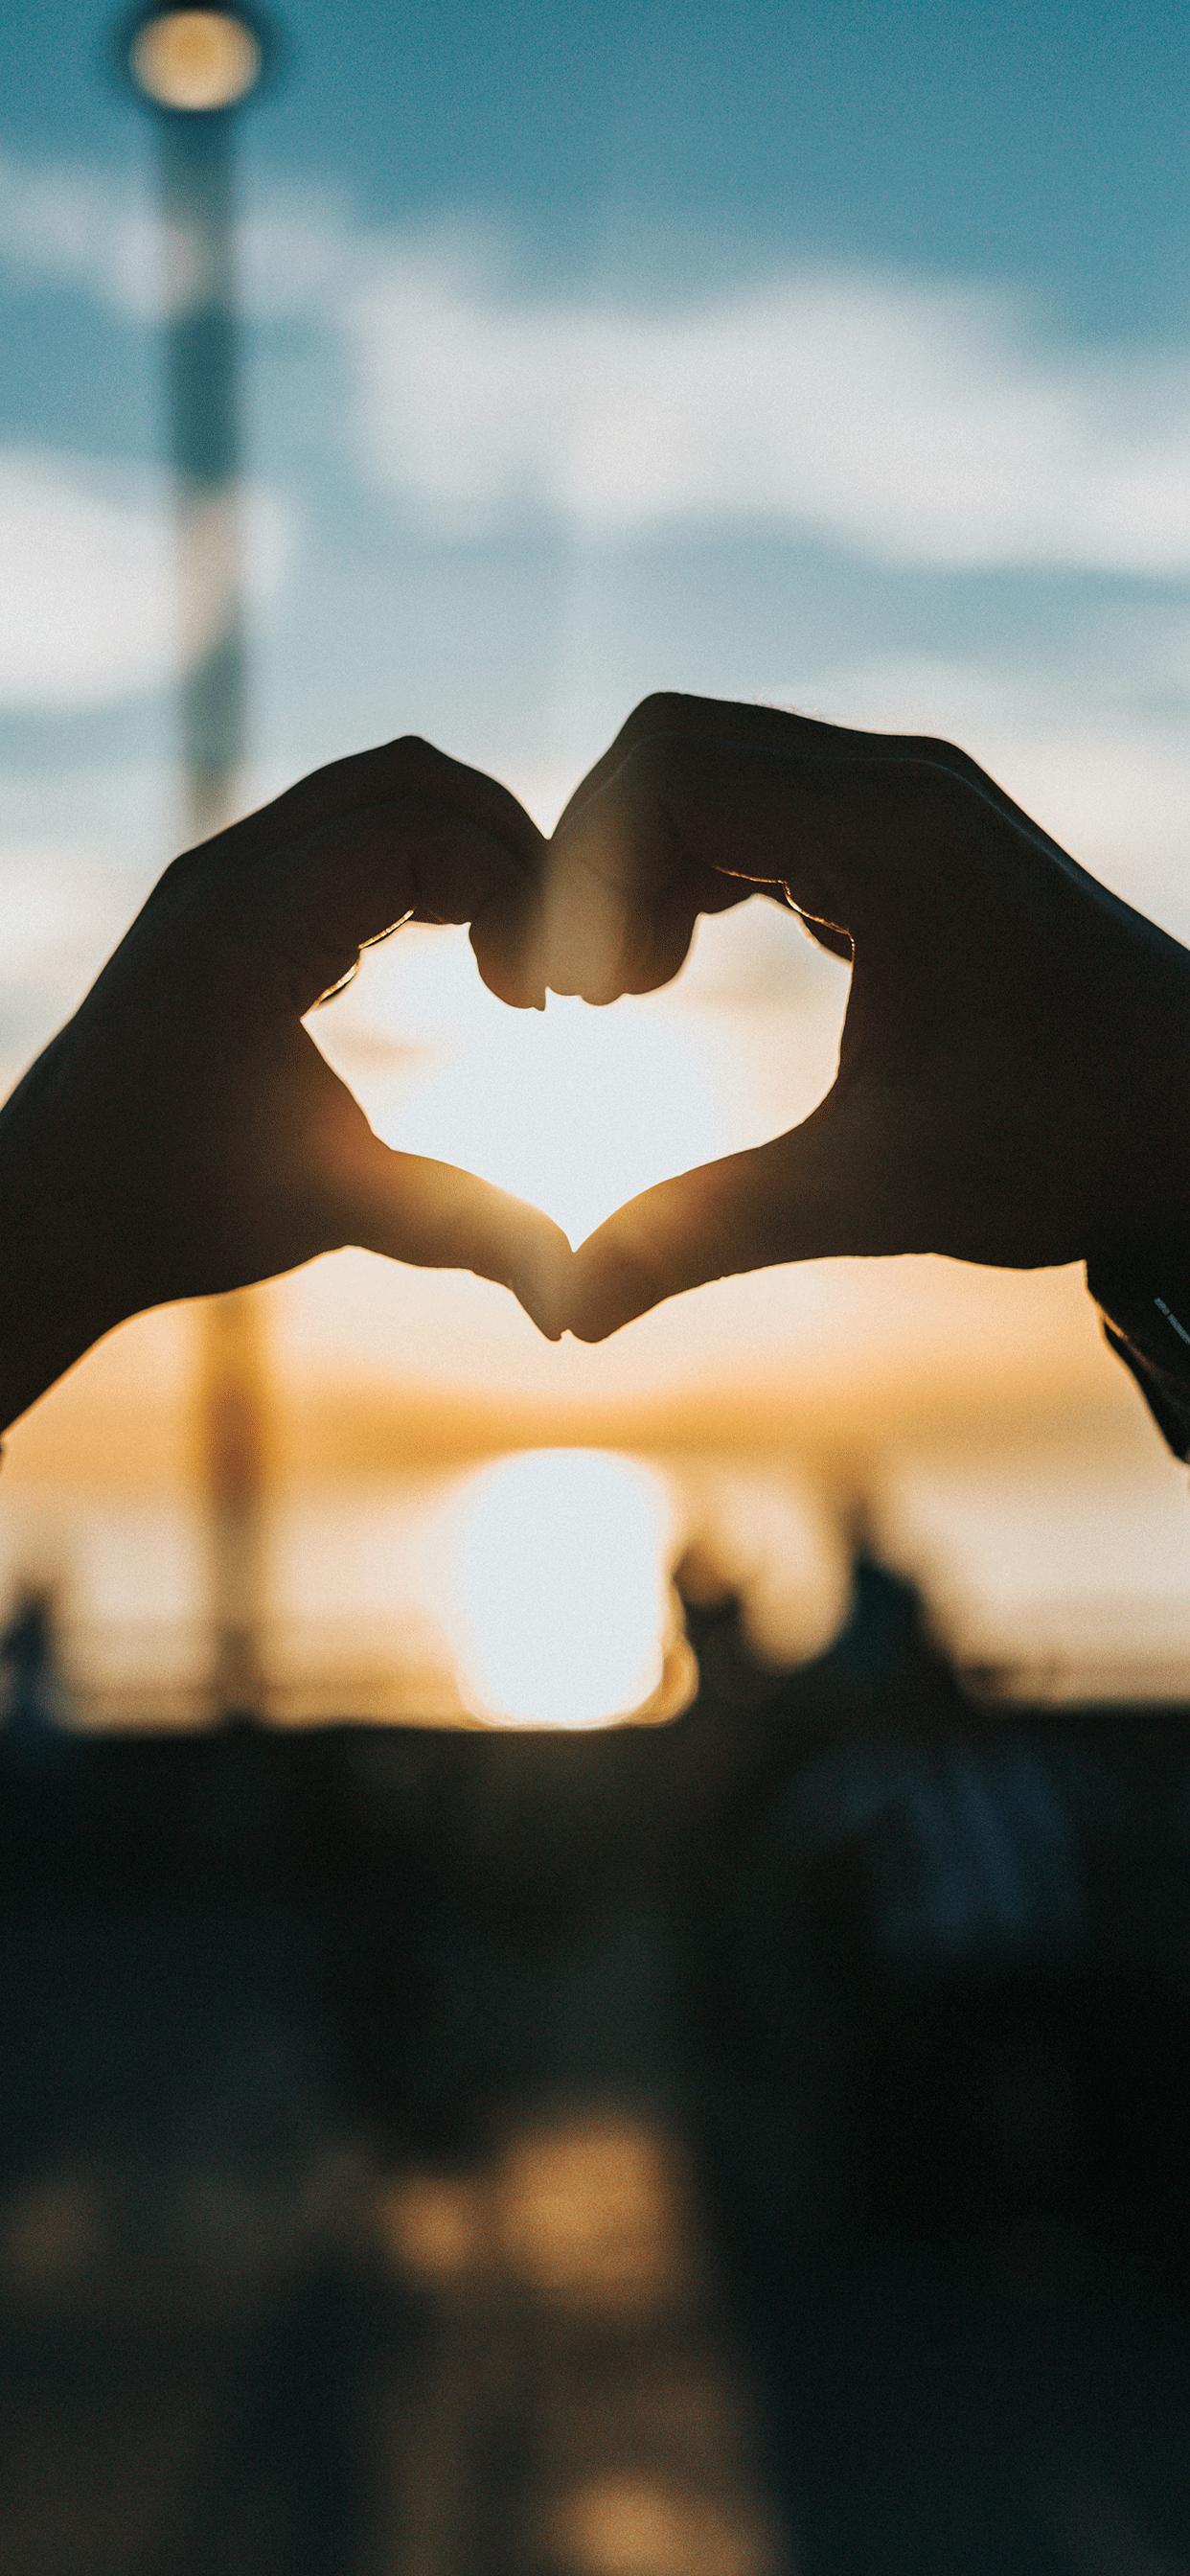 iPhone wallpaper love heart hands Valentines day